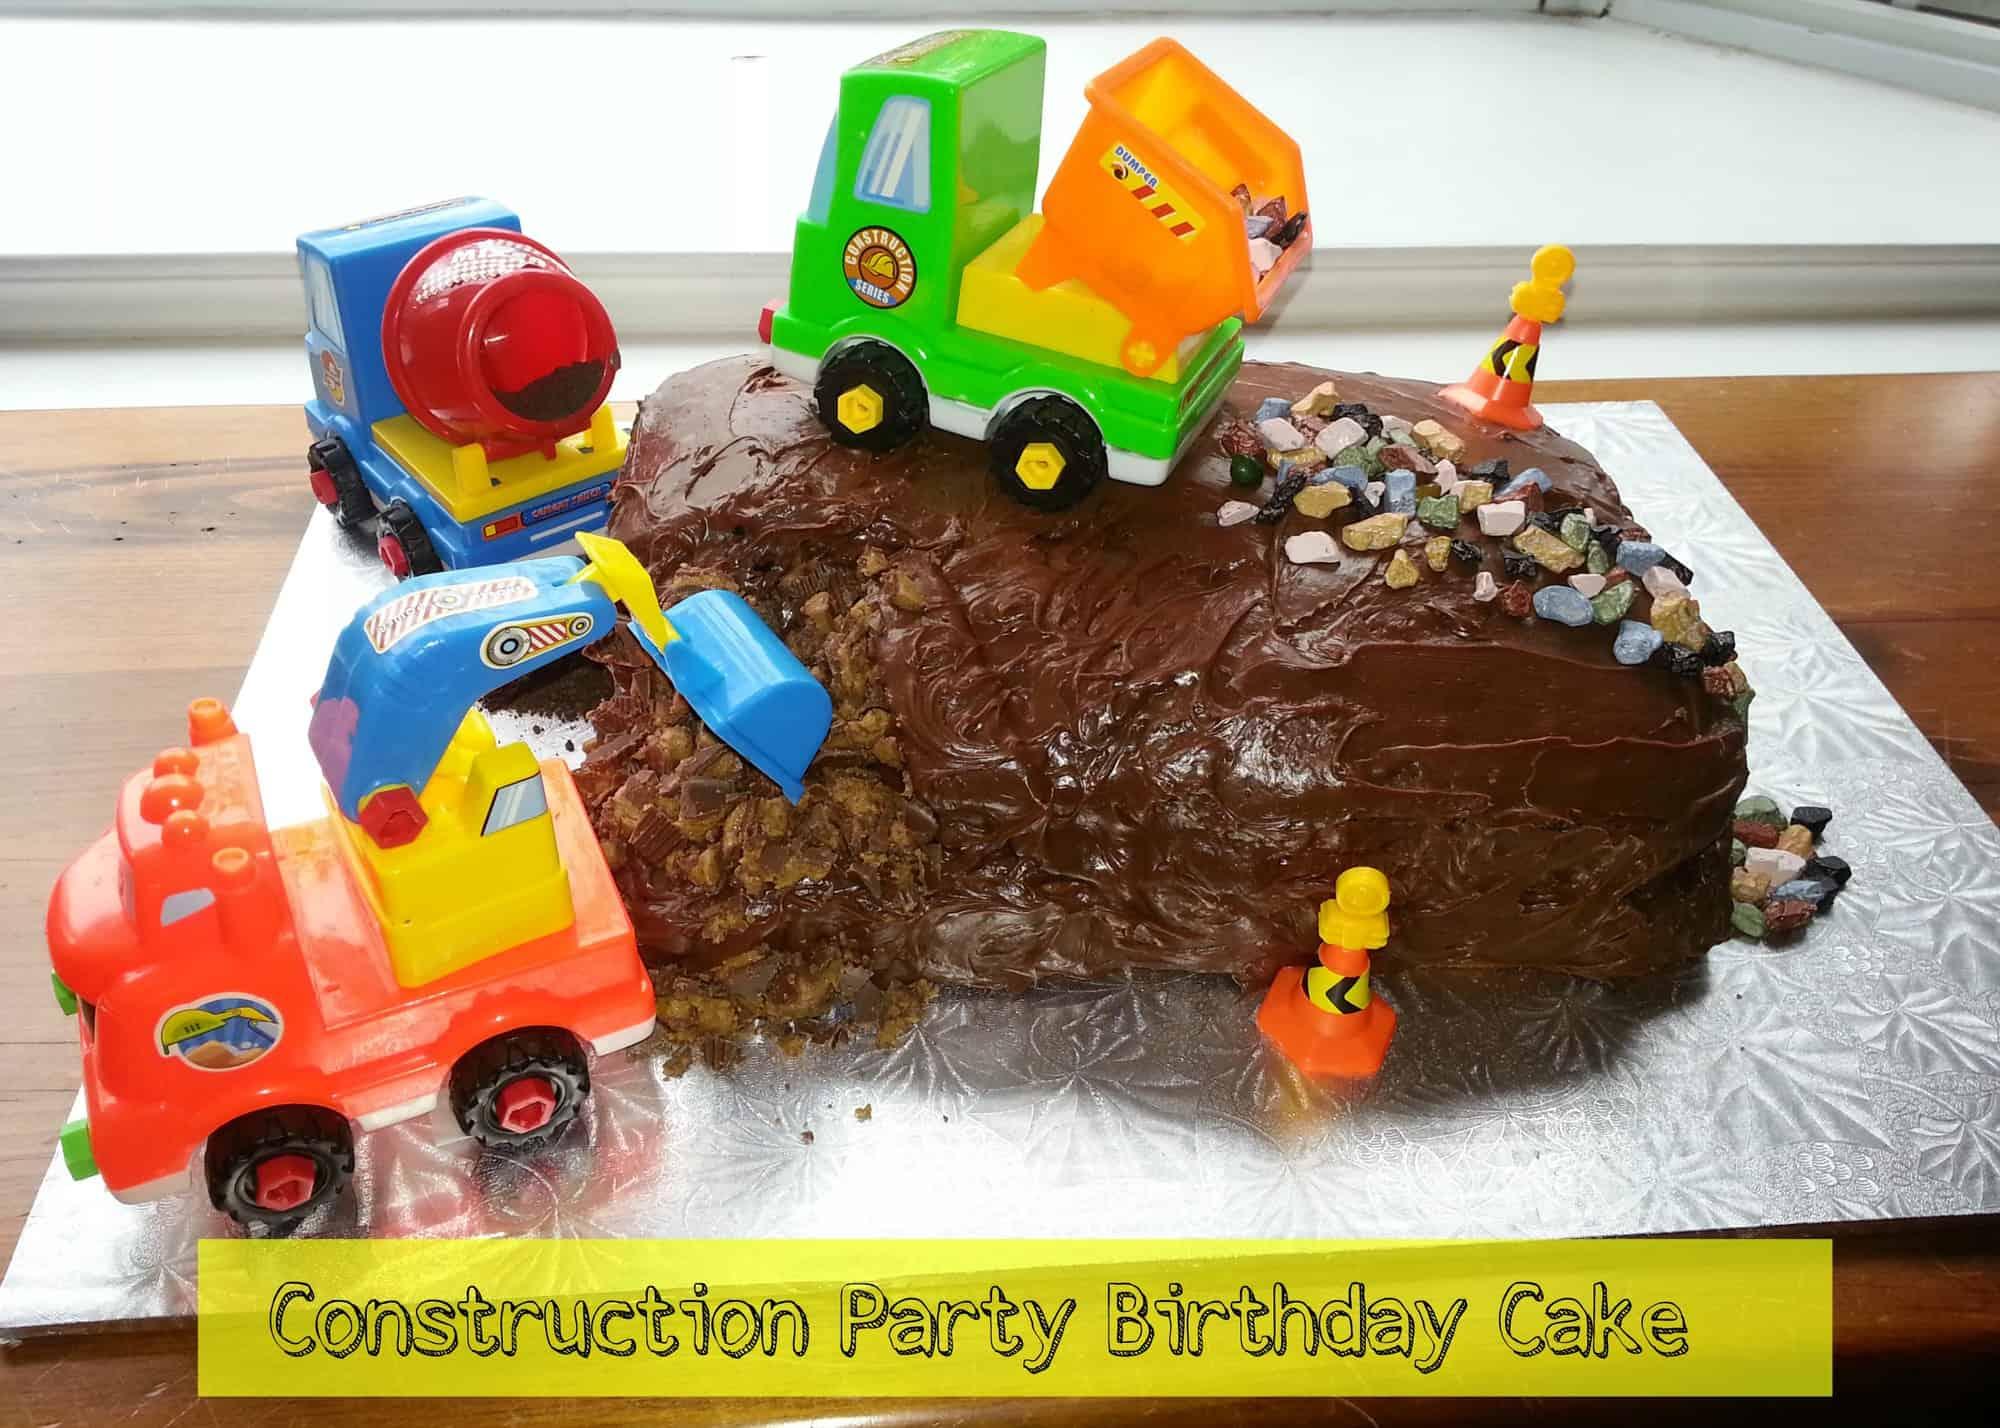 Birthday Party Ideas: Construction Party Birthday Cake